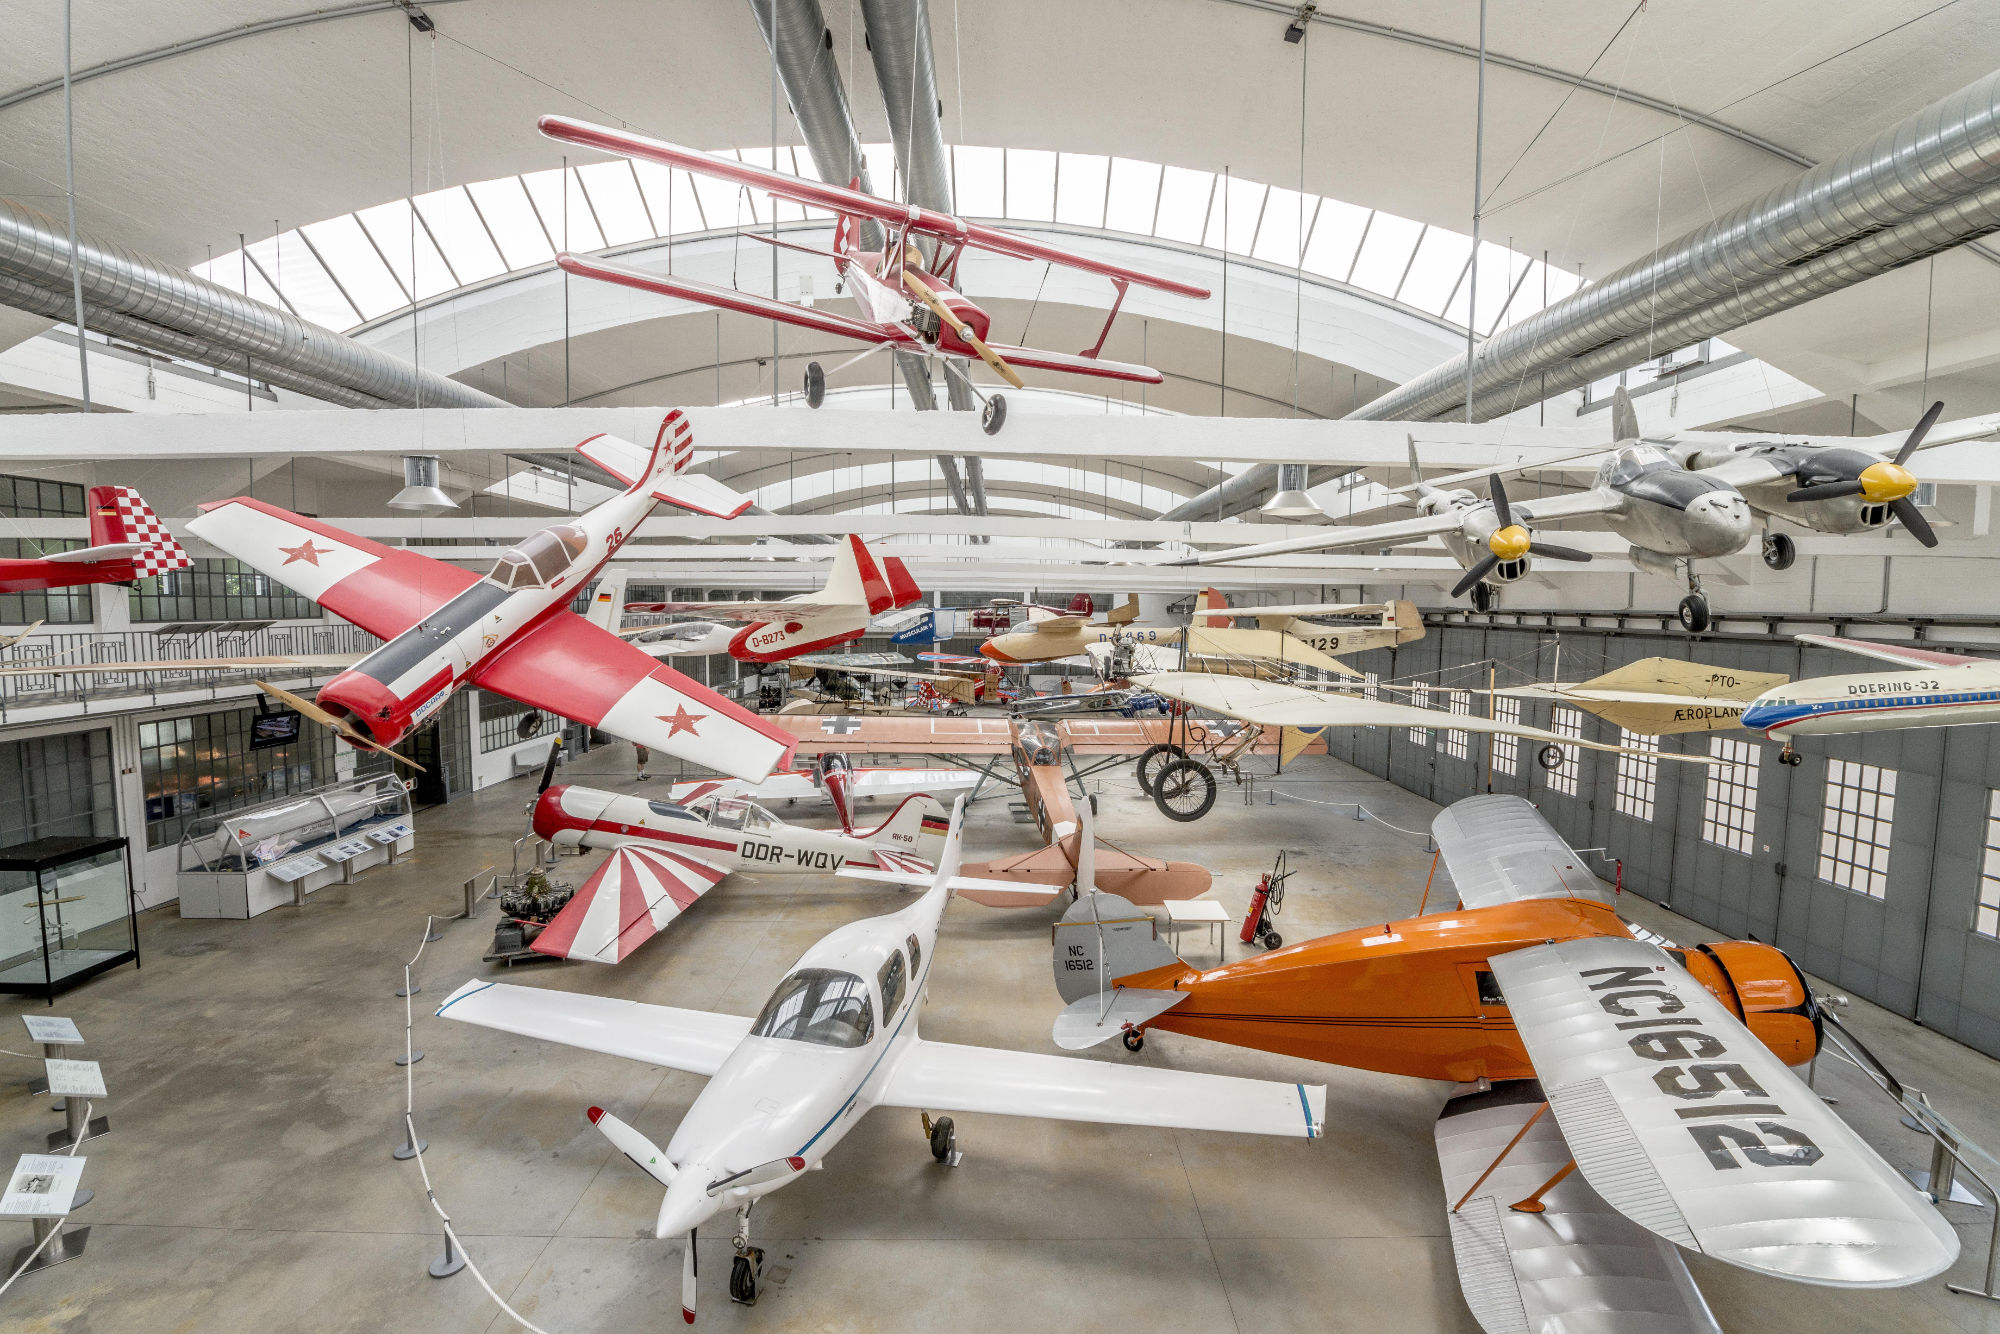 Flugwerft Schleißheim Flugzeughangar